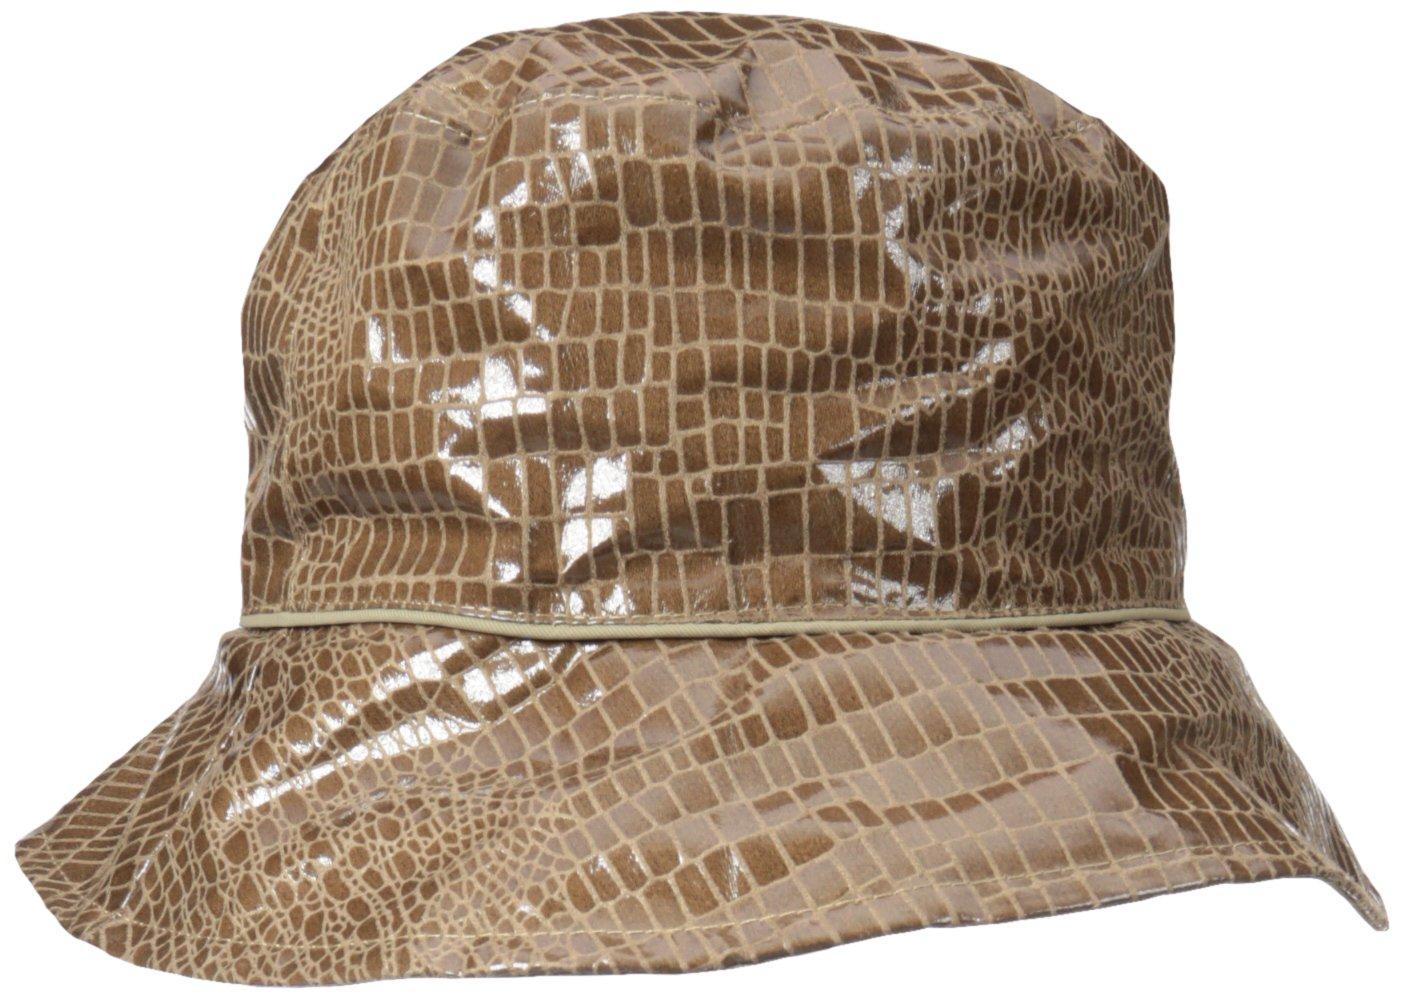 Nine West Women's Reversible Bucket Rain Hat, Taupe, One Size by Nine West